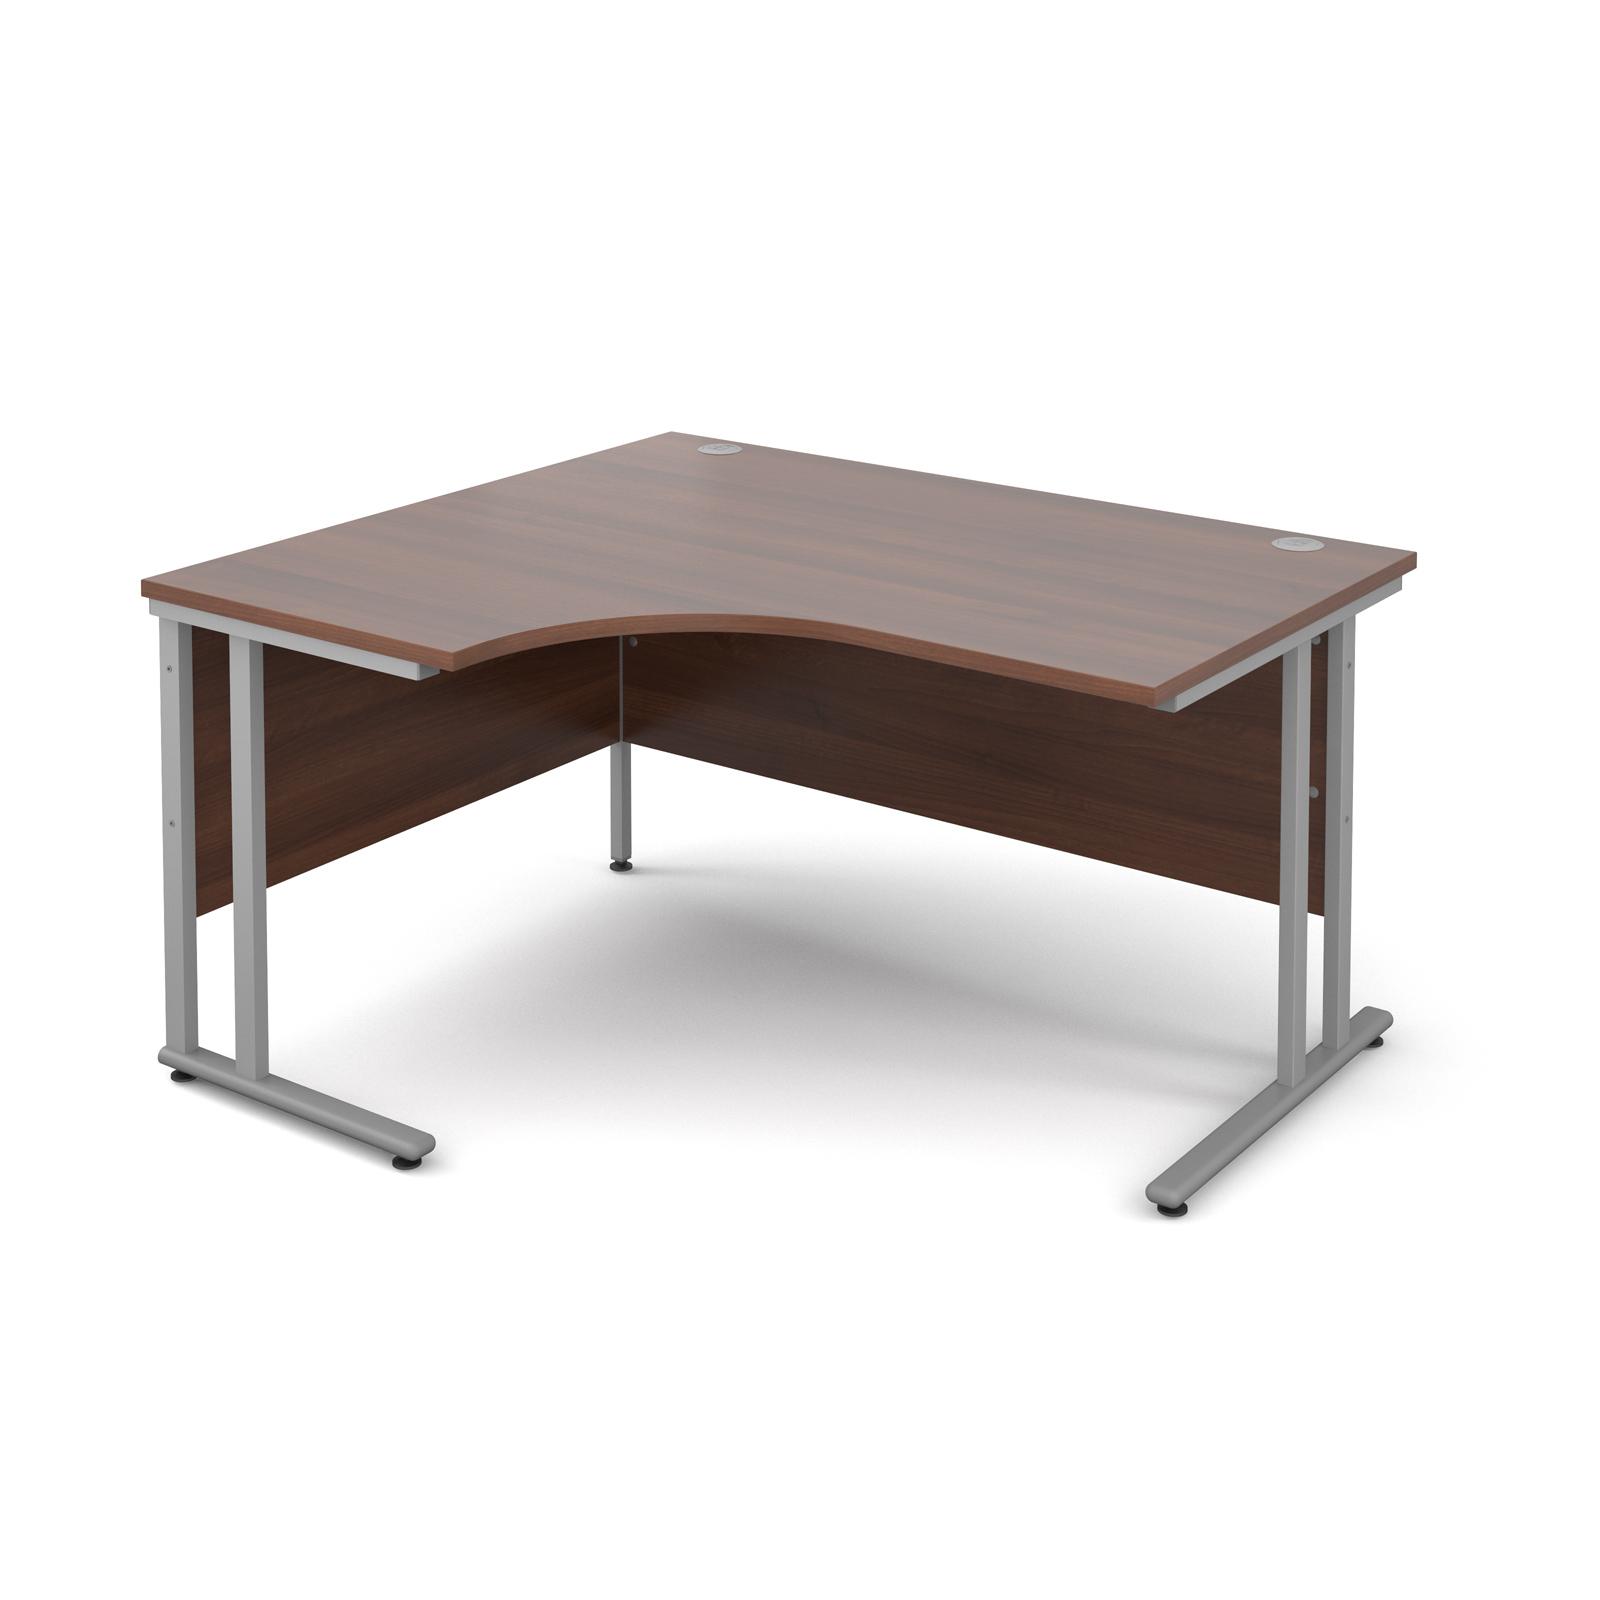 Maestro 25 SL left hand ergonomic desk 1400mm - silver cantilever frame, walnut top